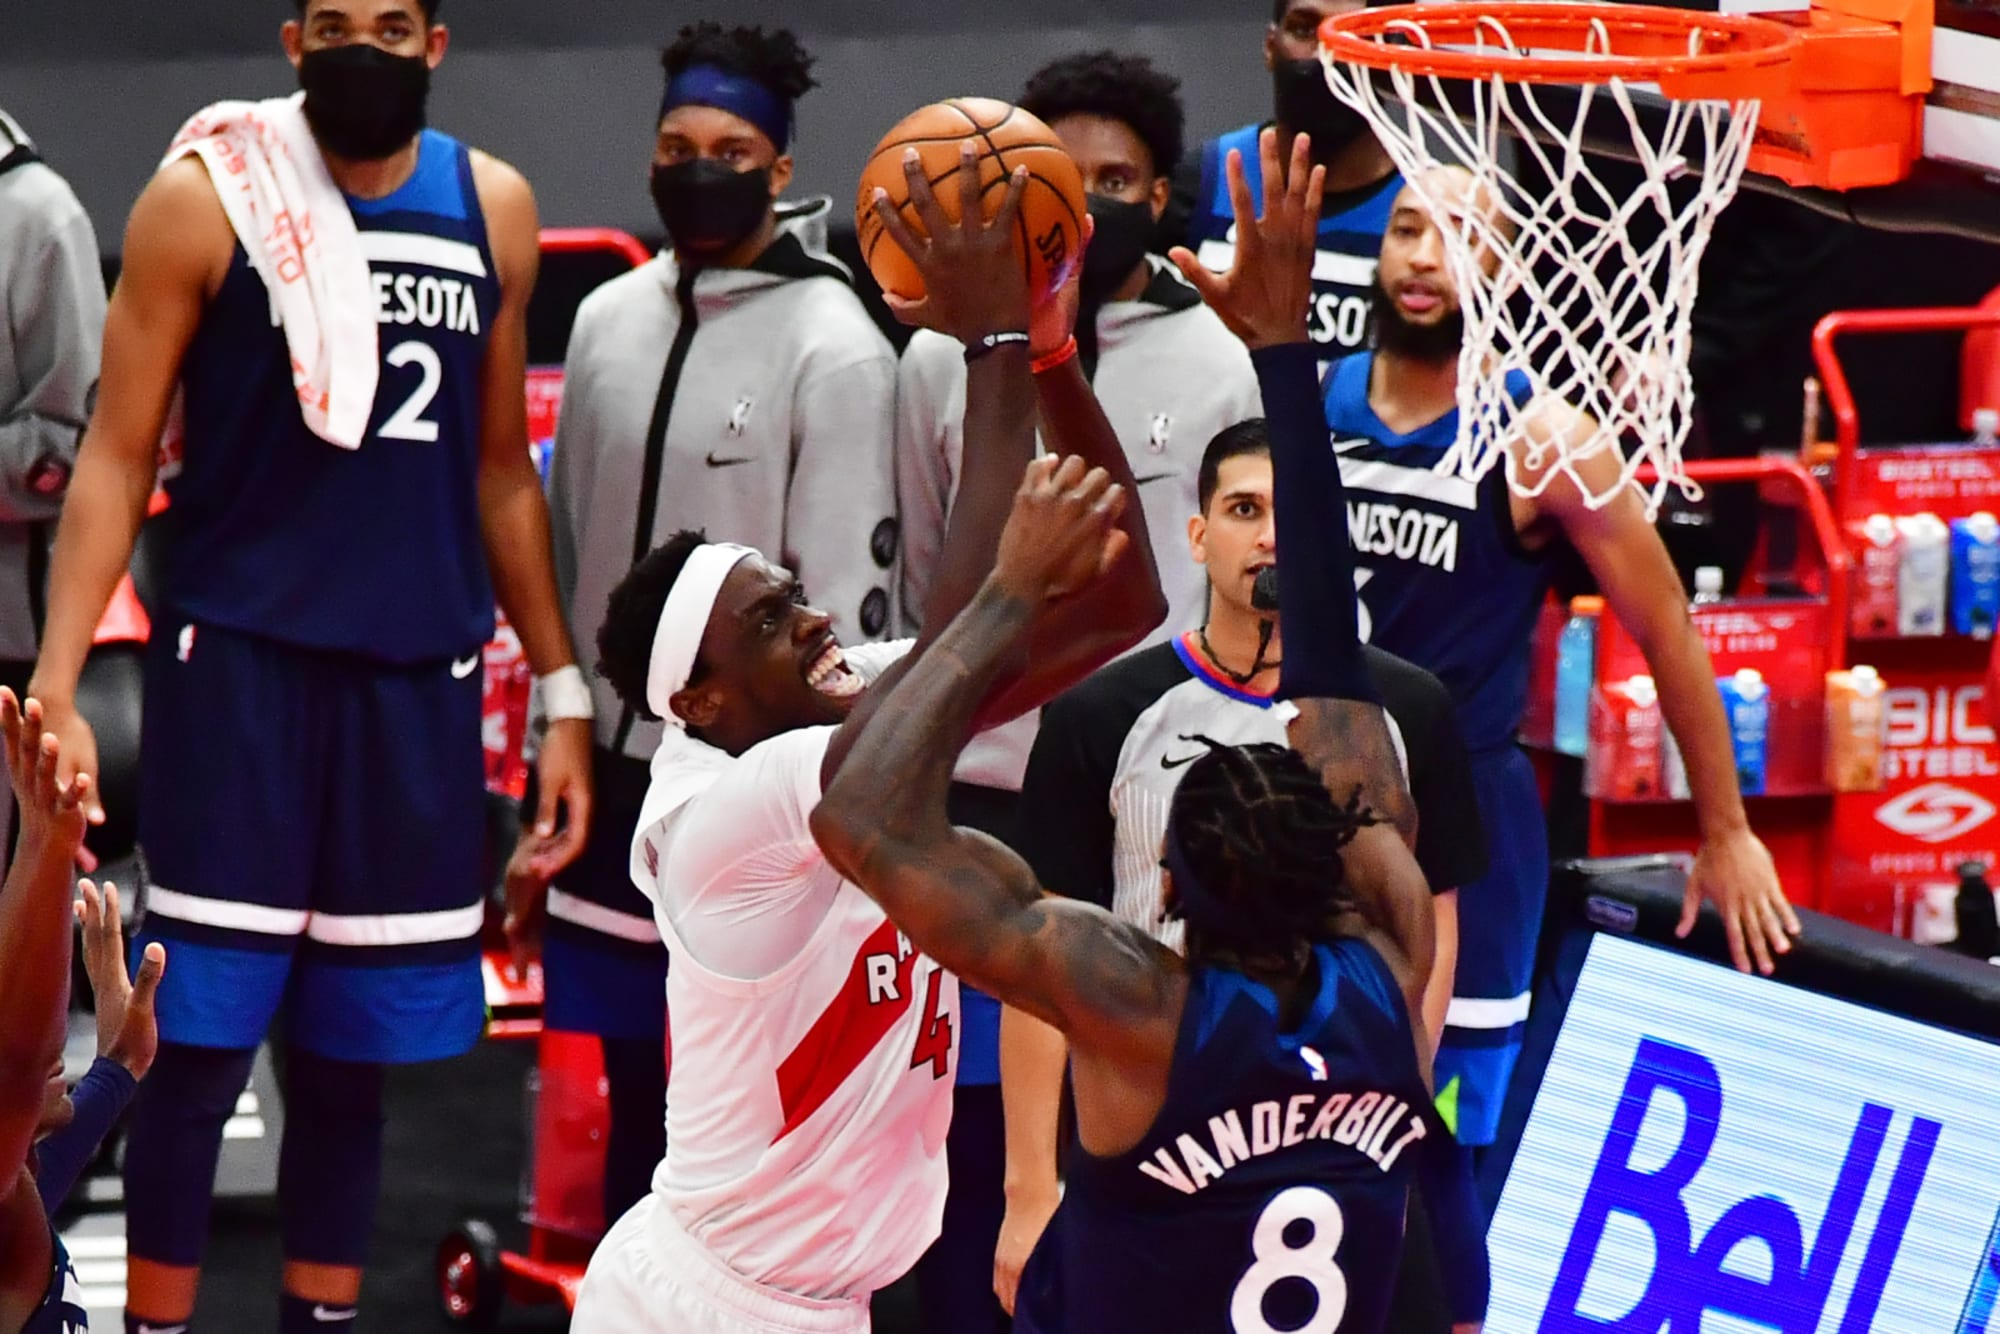 Toronto Raptors: Net rating shows this Raptors team is the unluckiest squad in 2021